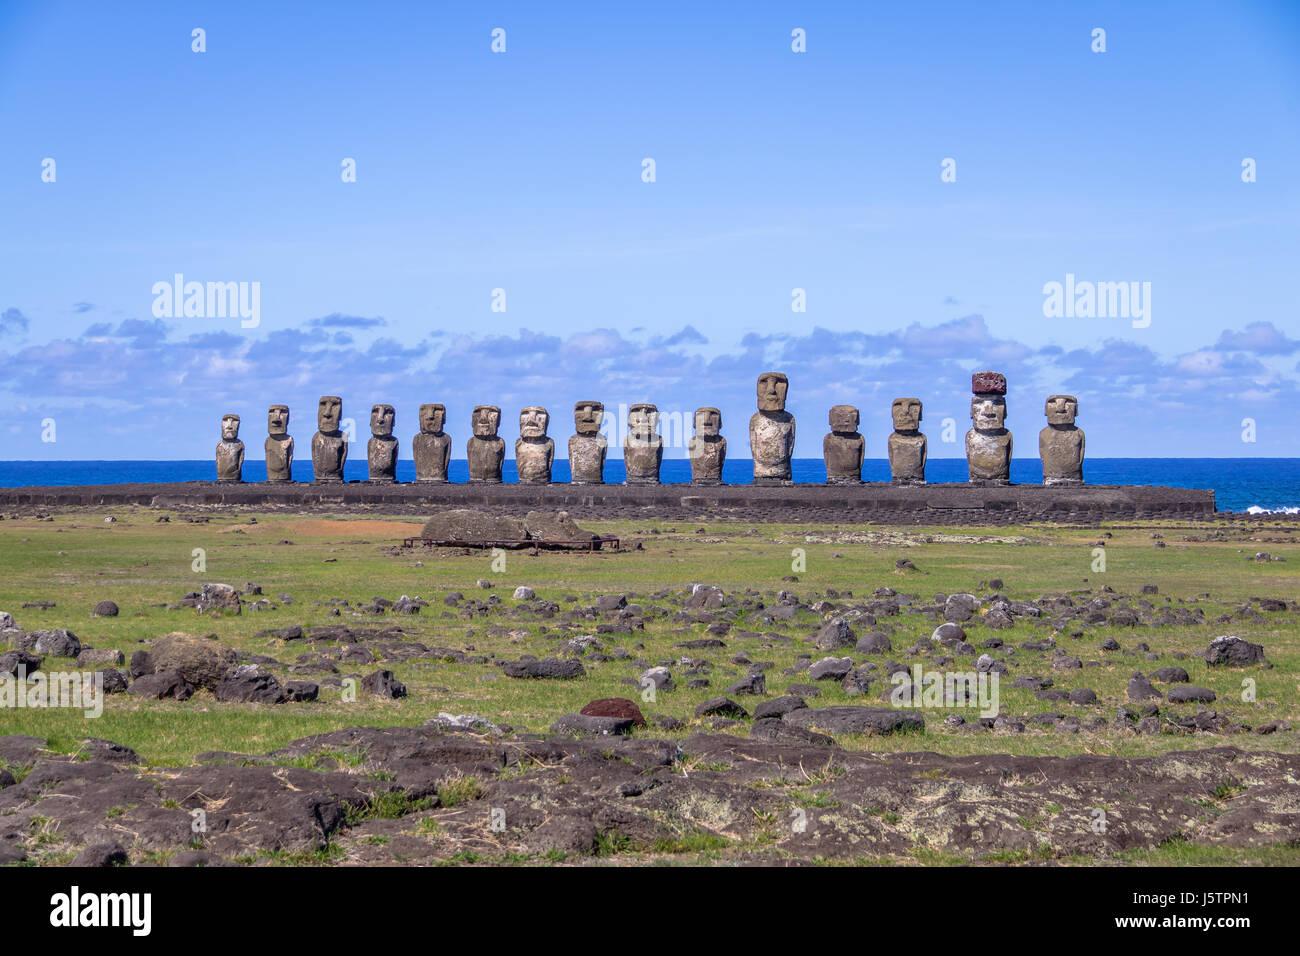 Estatuas Moai de Ahu Tongariki, Isla de Pascua, Chile Imagen De Stock